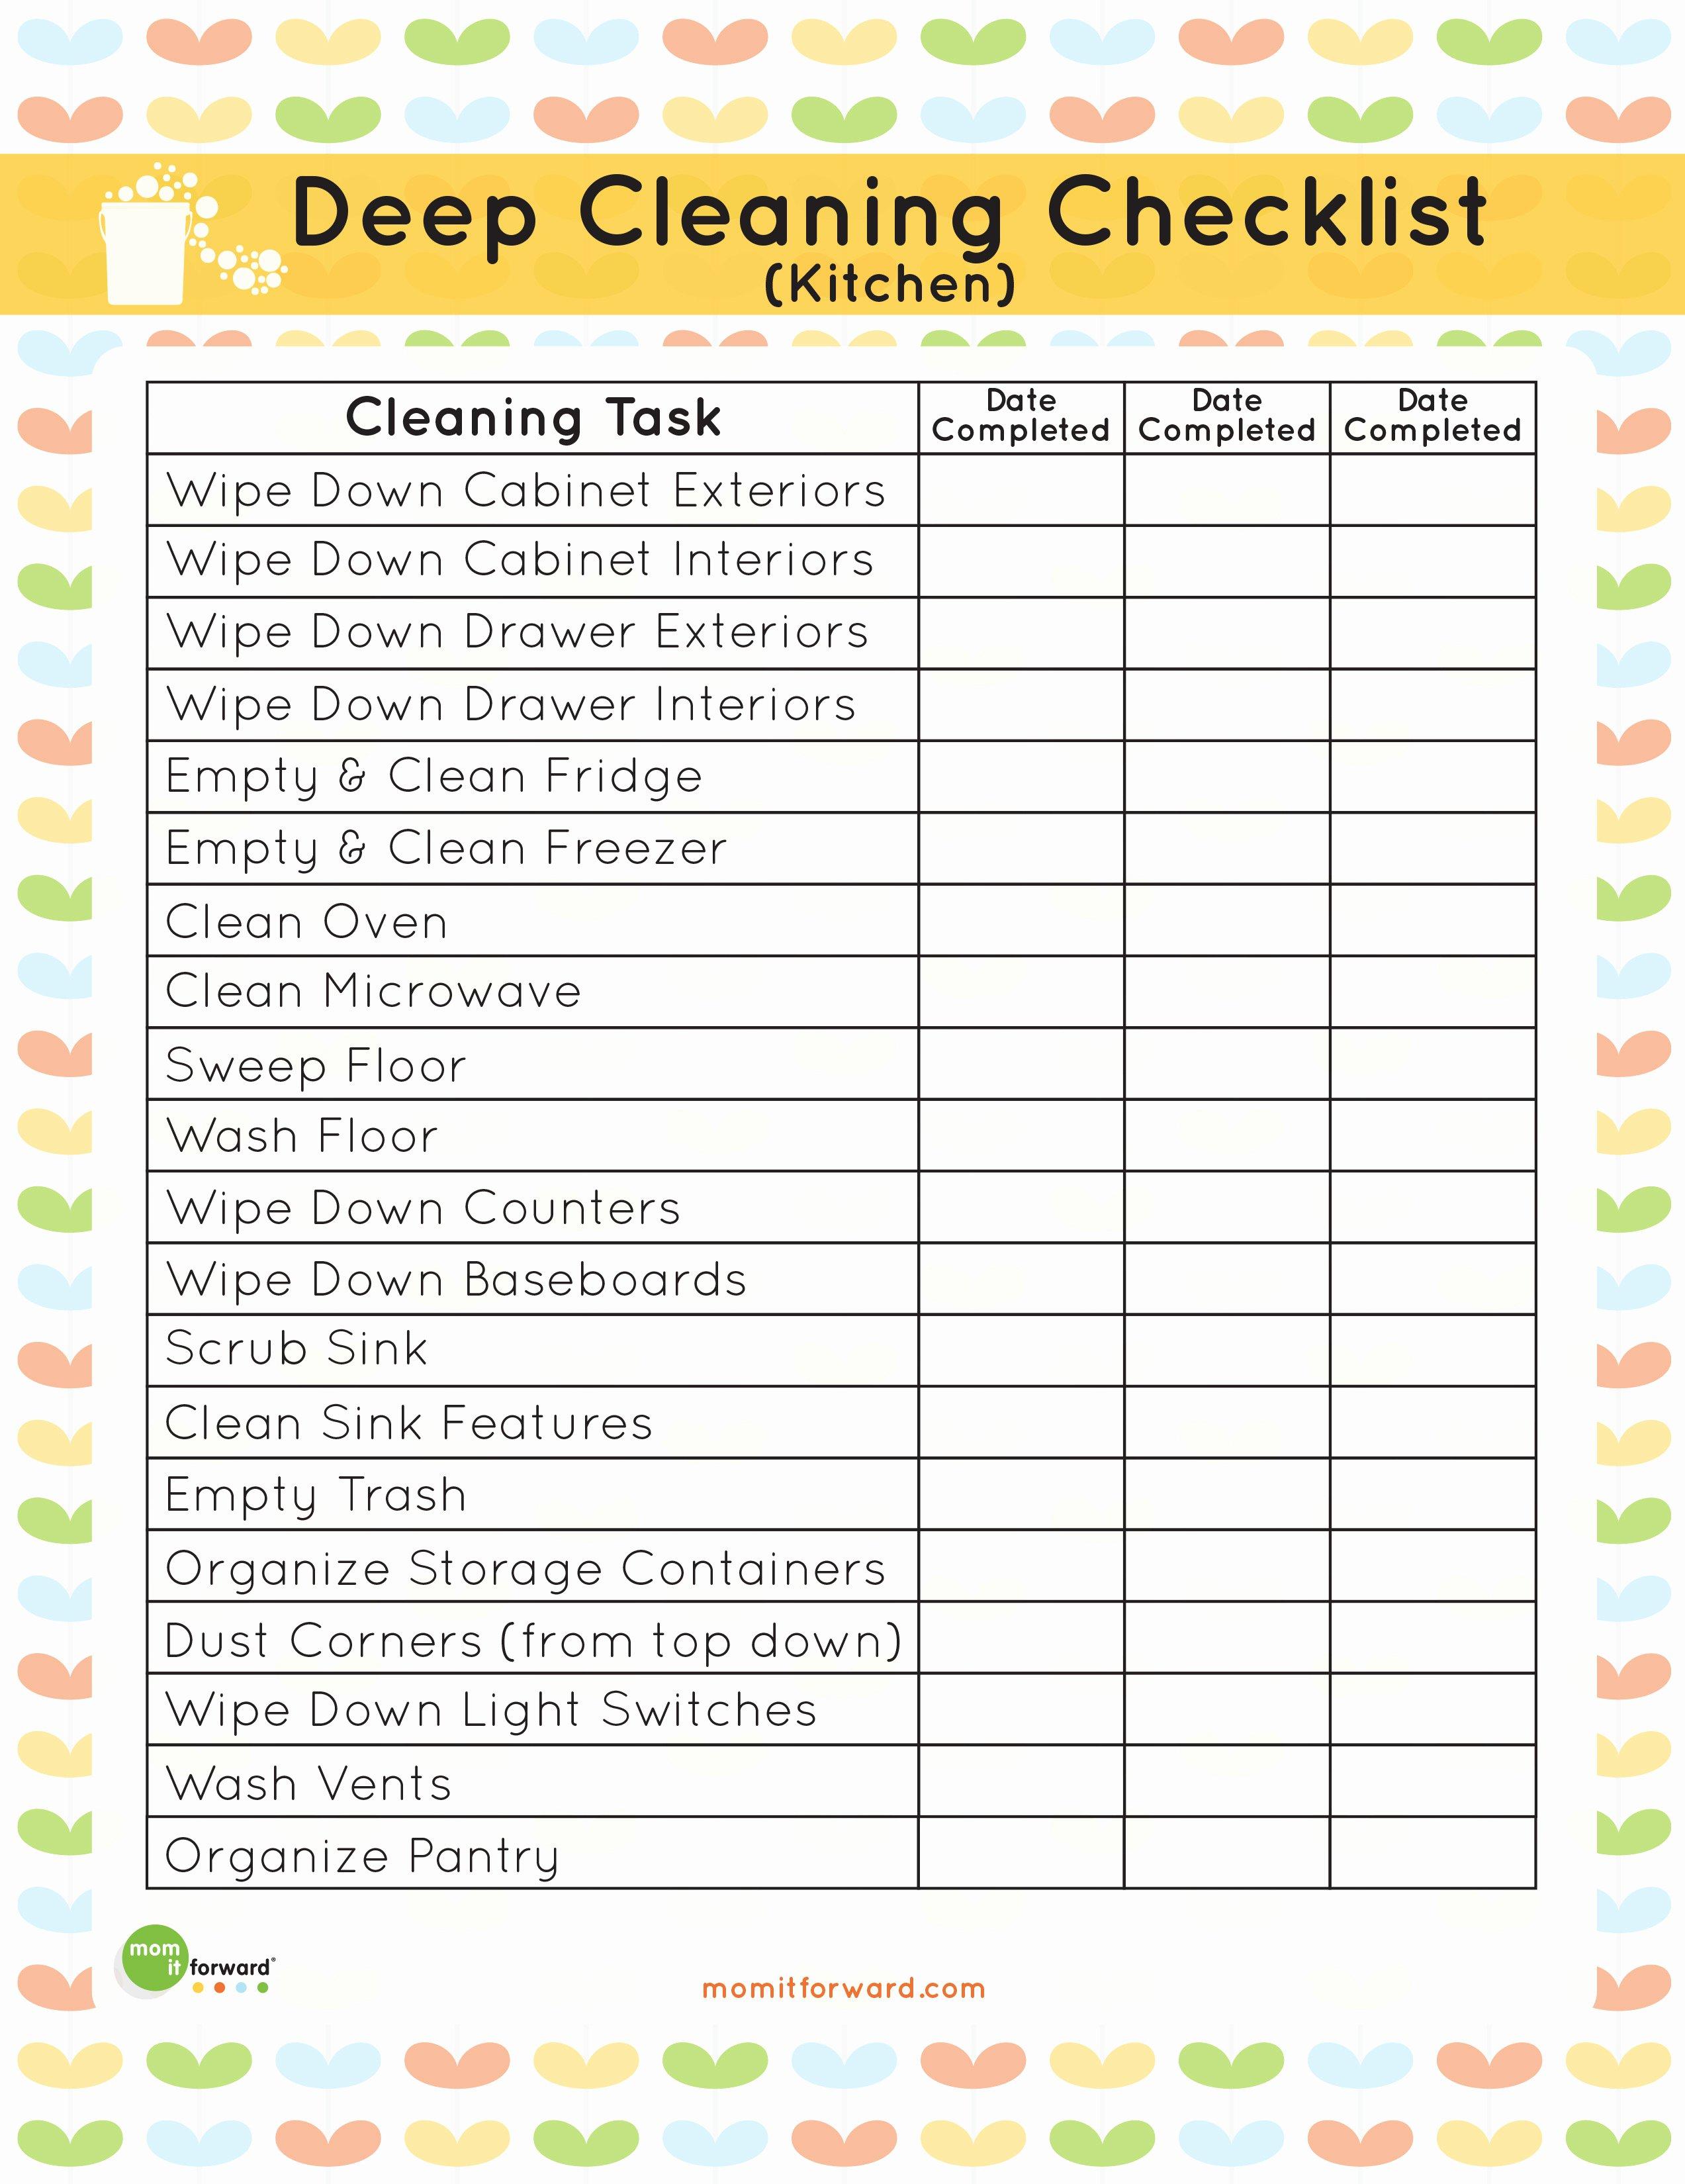 Restaurant Kitchen Cleaning Checklist Template Beautiful Printable Kitchen Cleaning Checklist Mom It forwardmom